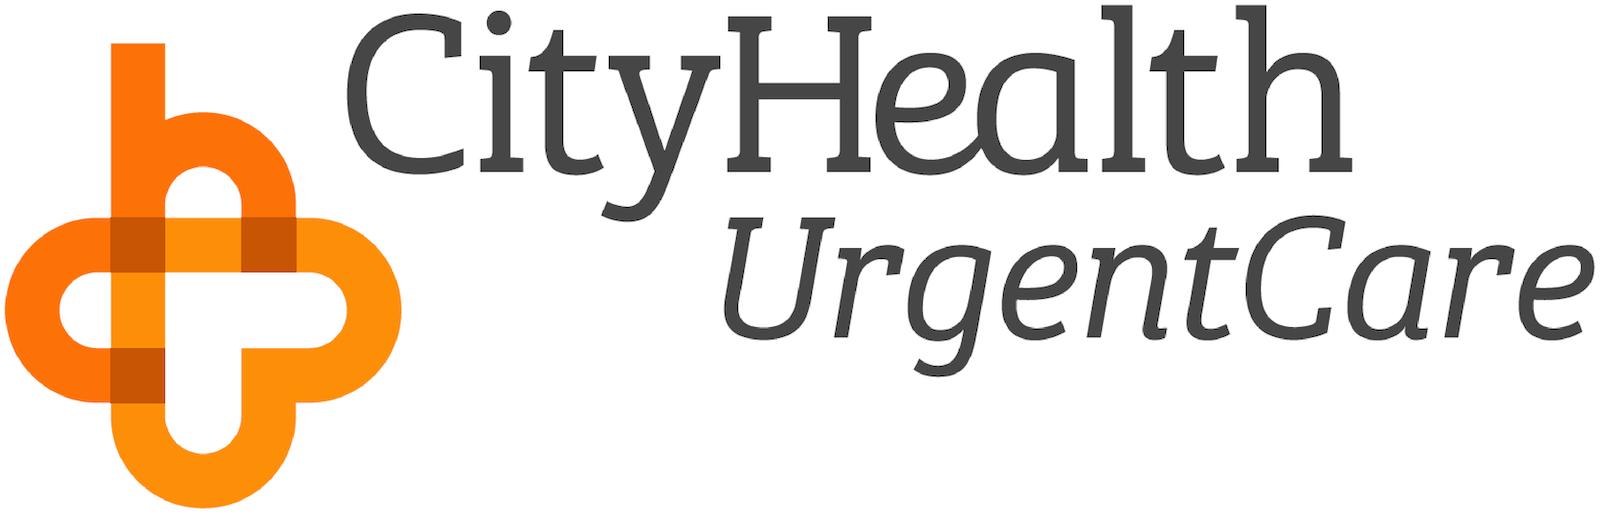 CityHealth Urgent Care - Oakland Logo